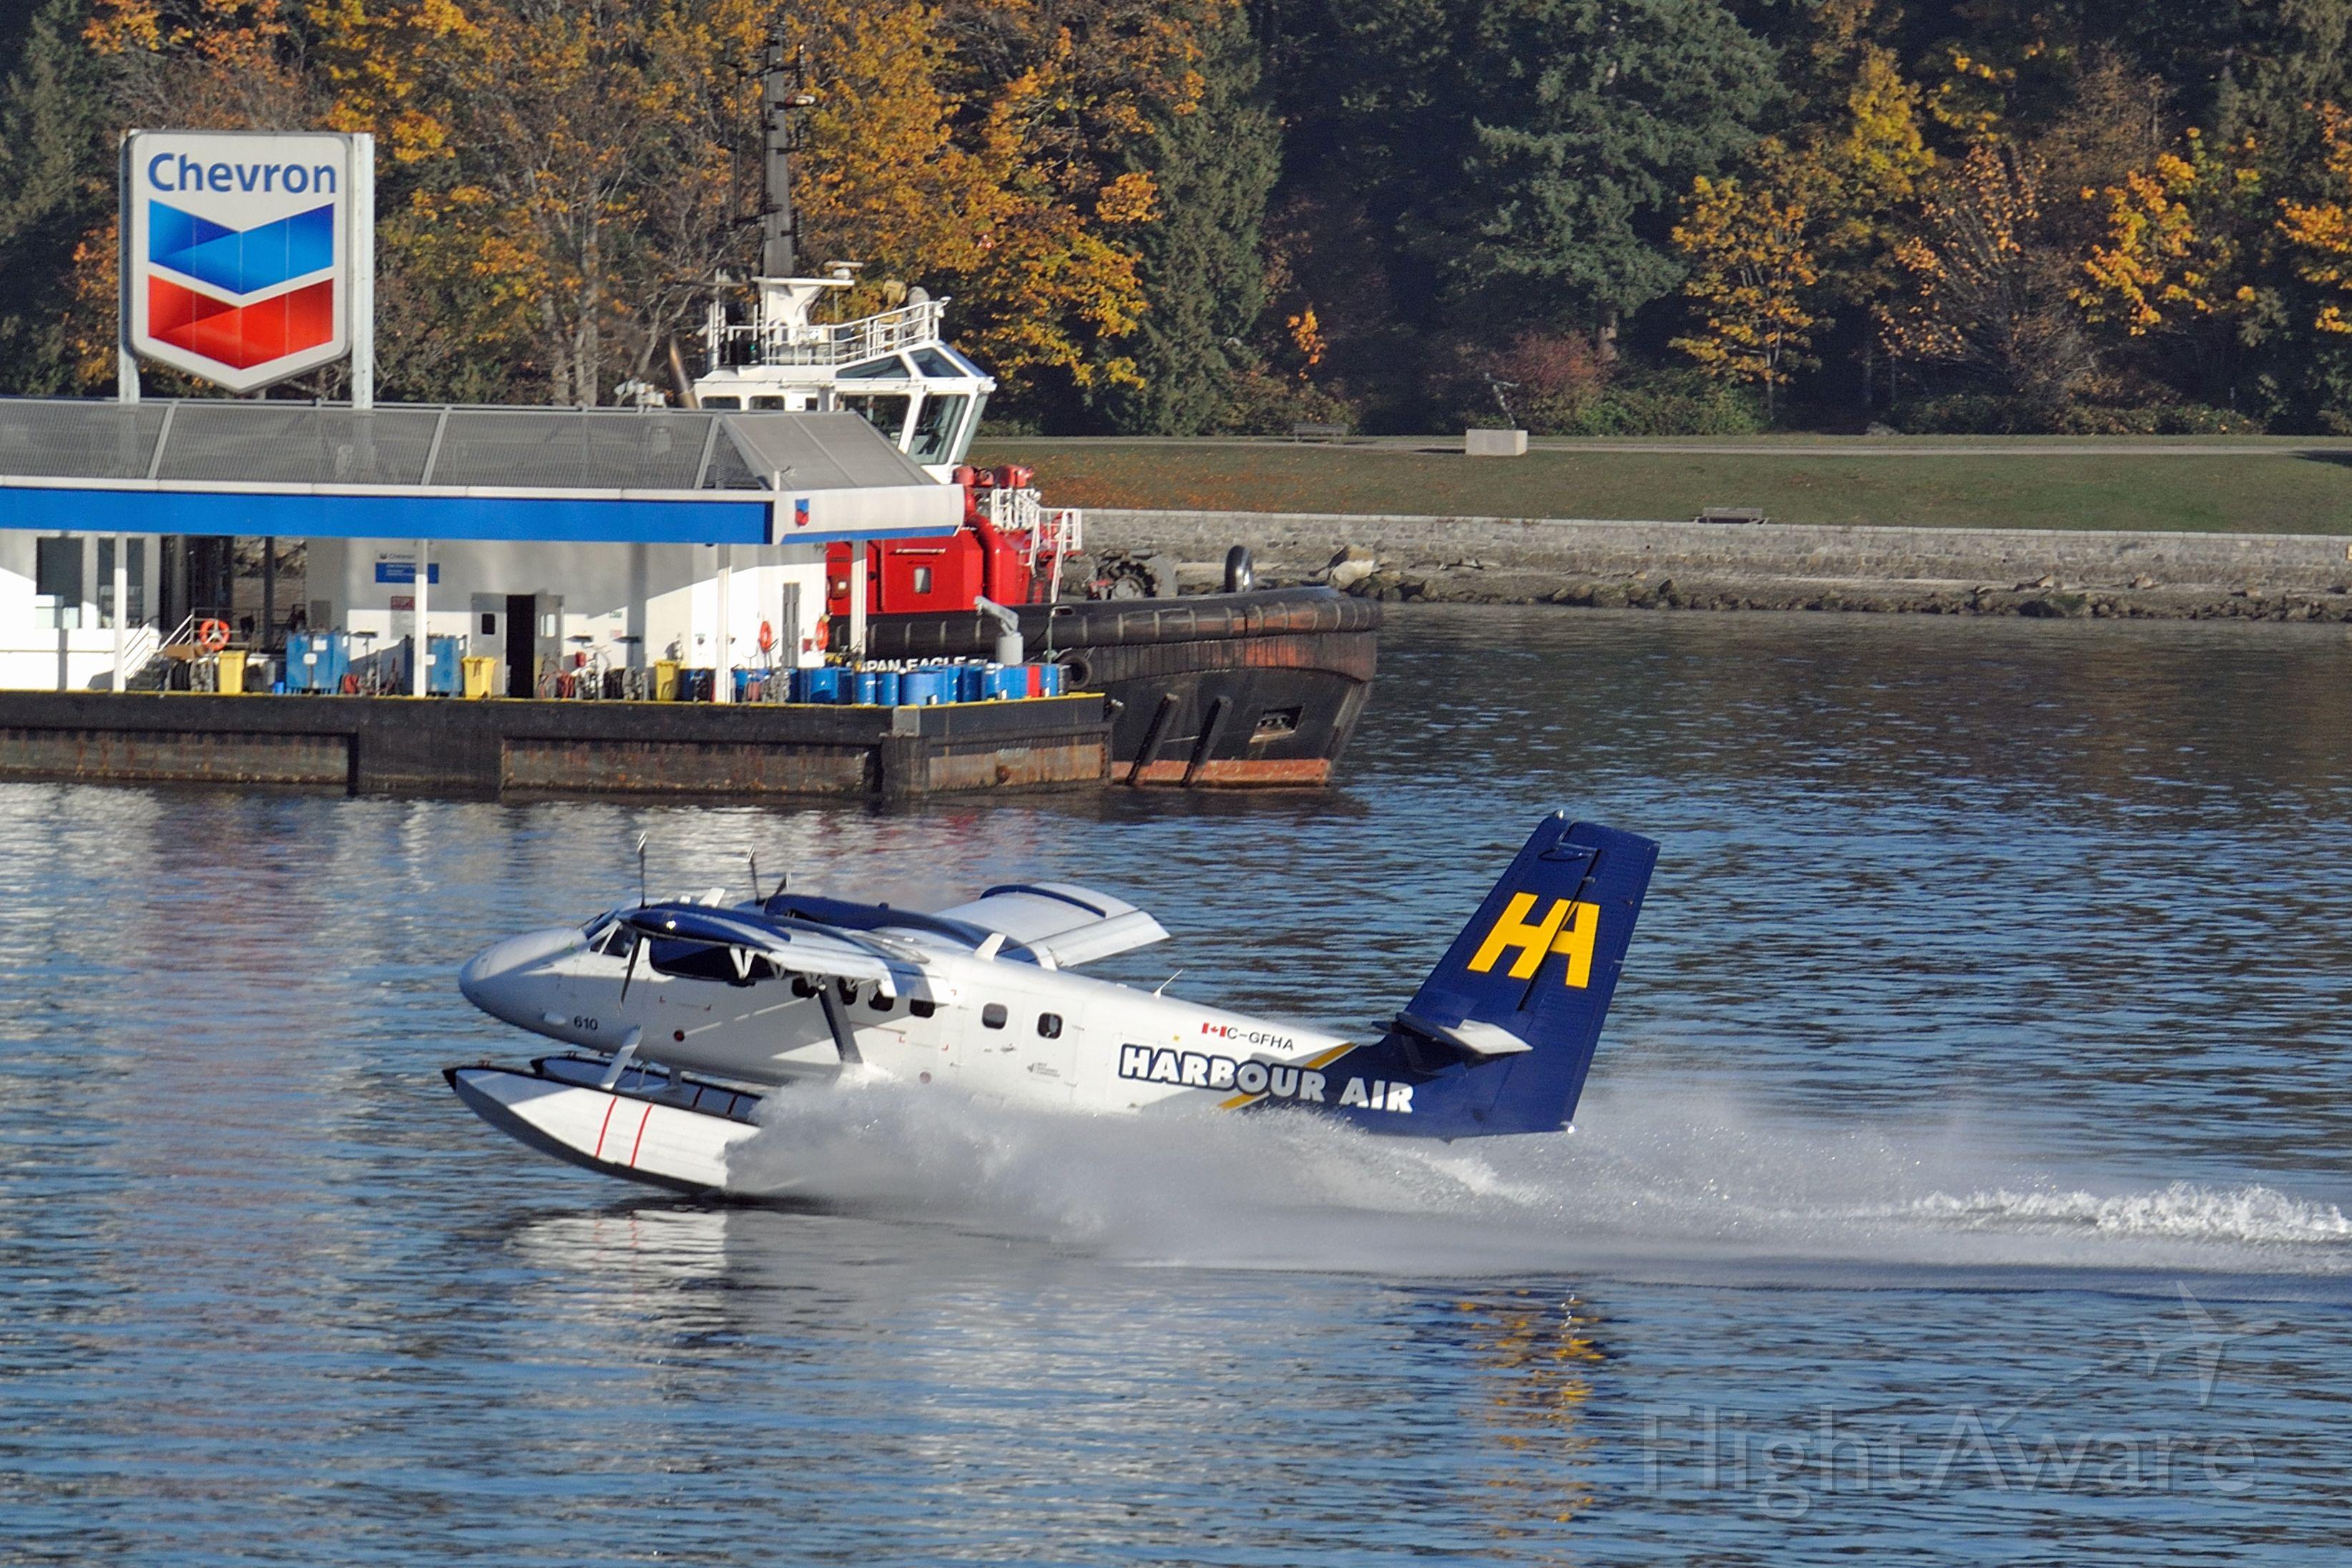 De Havilland Canada Twin Otter (C-GFHA)